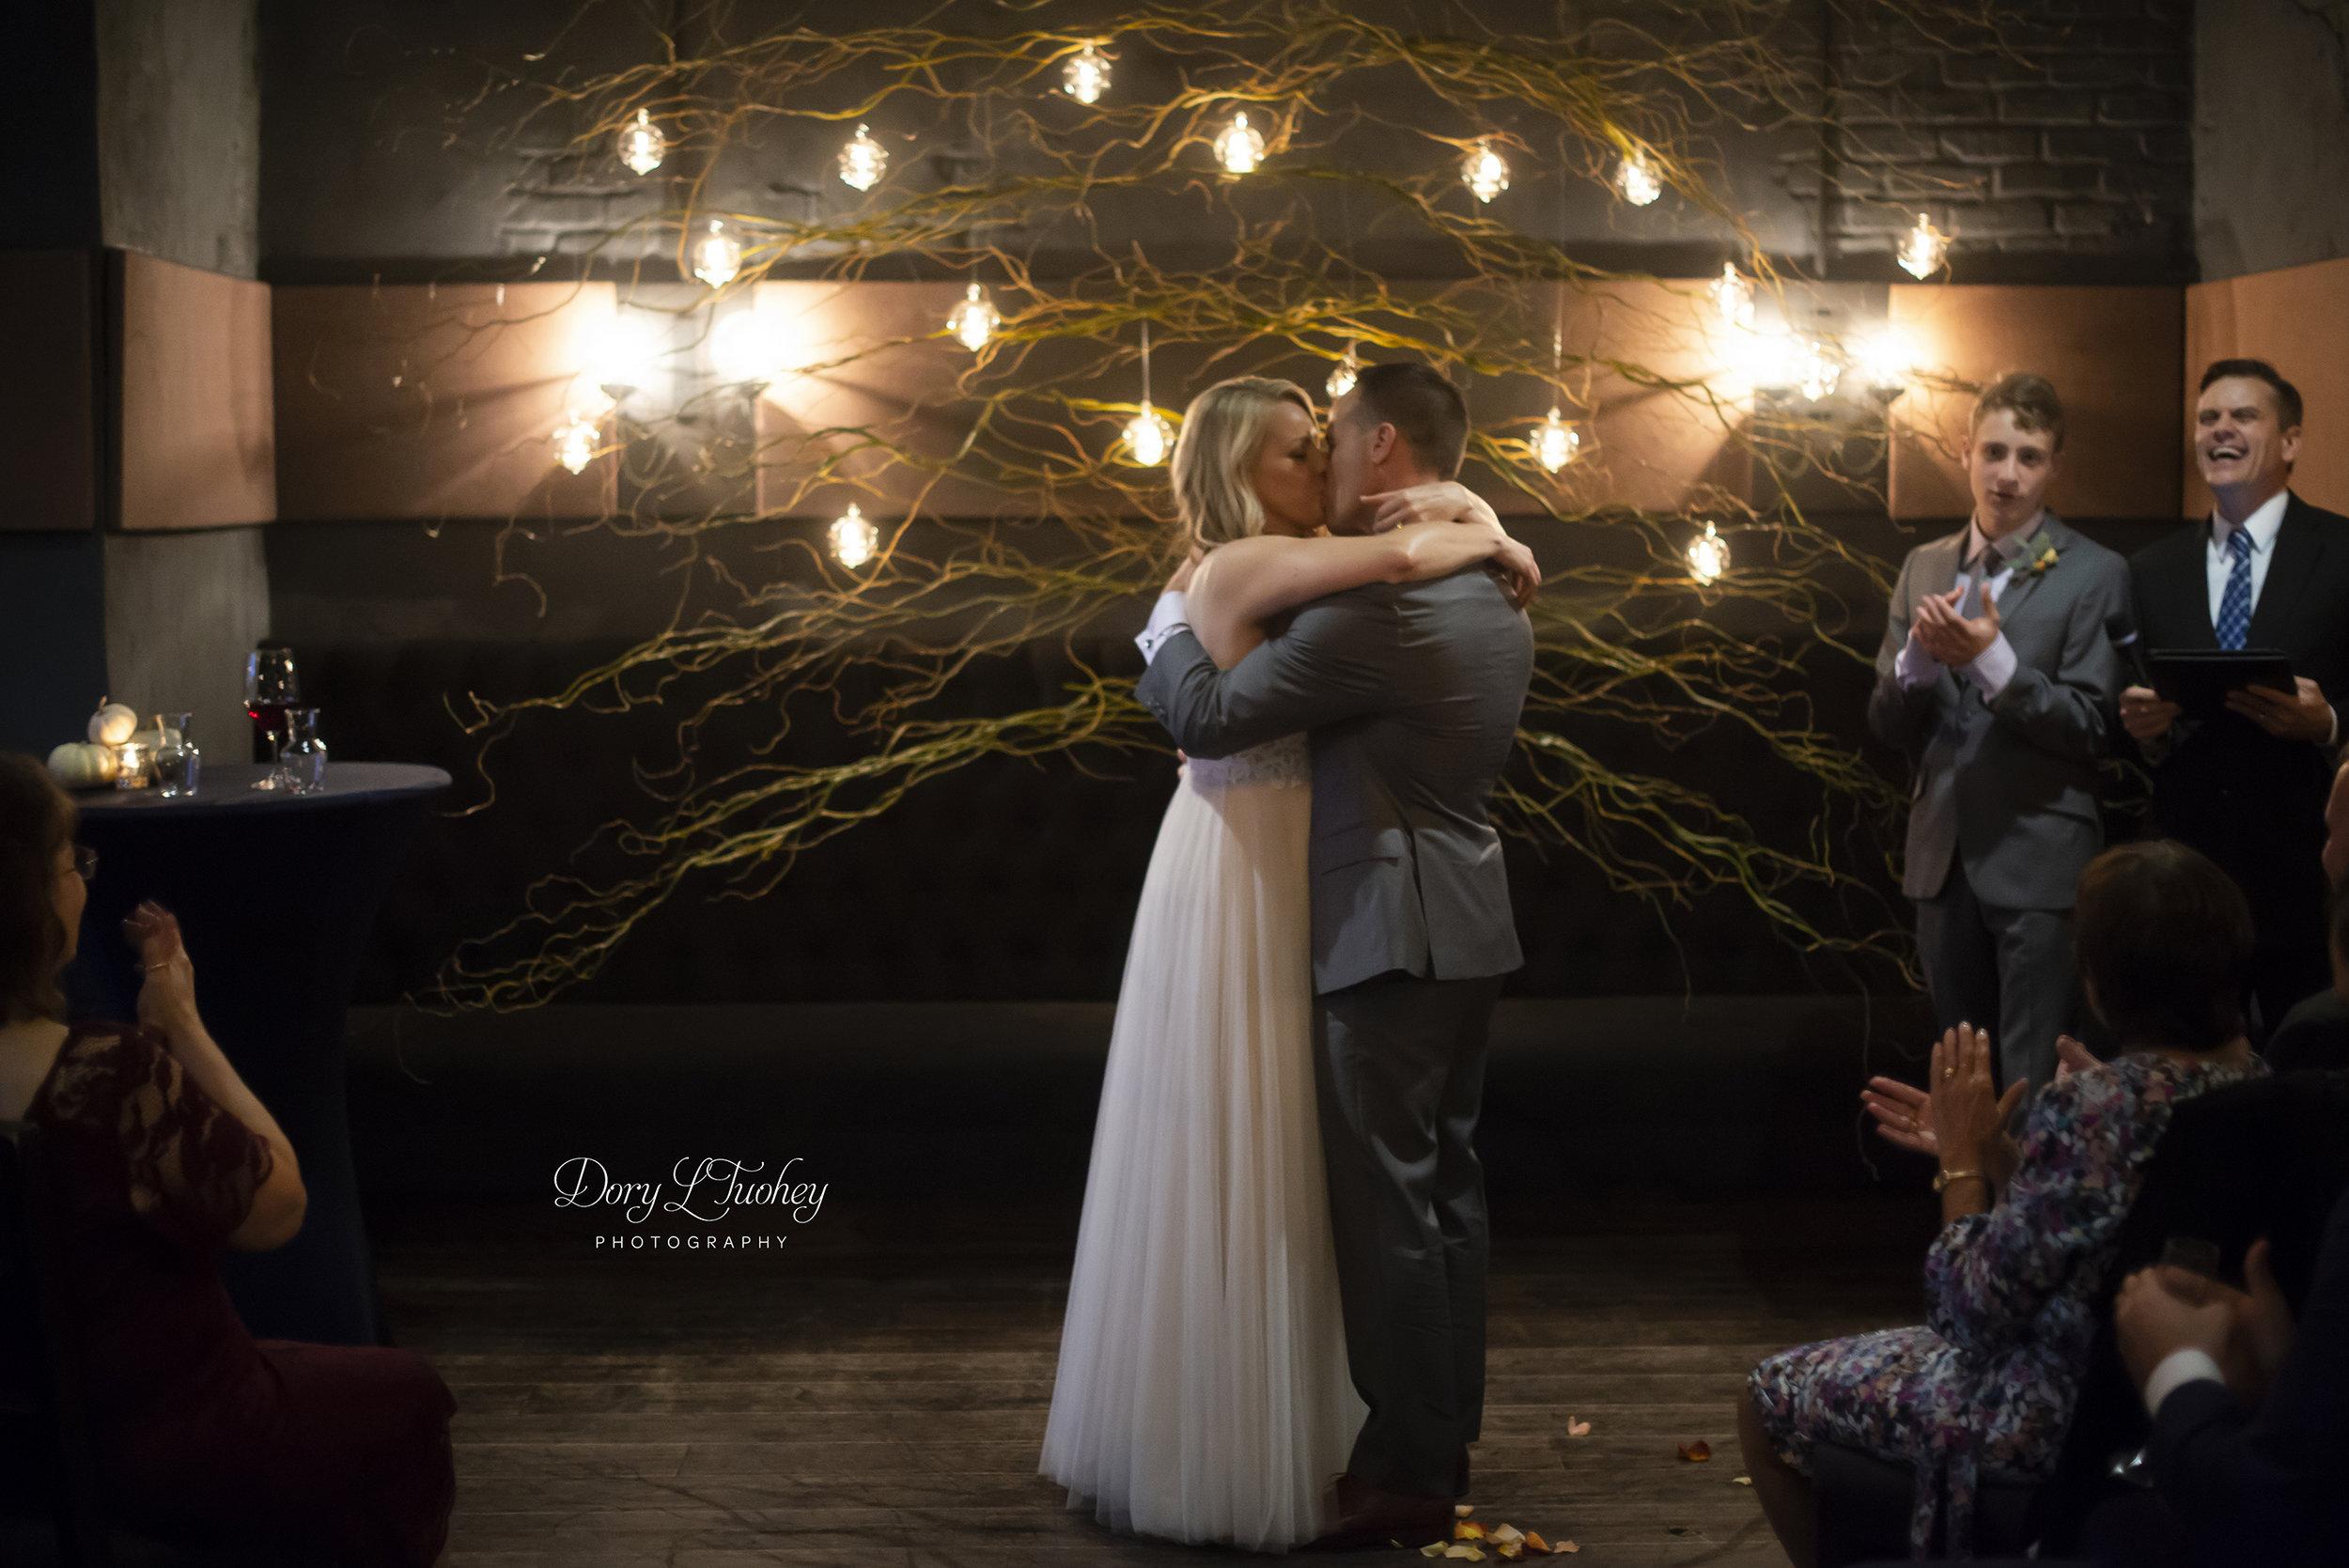 Rookery_chicago_dory_photographer_wedding_stairs_bhldn_love_dawson_15.jpg